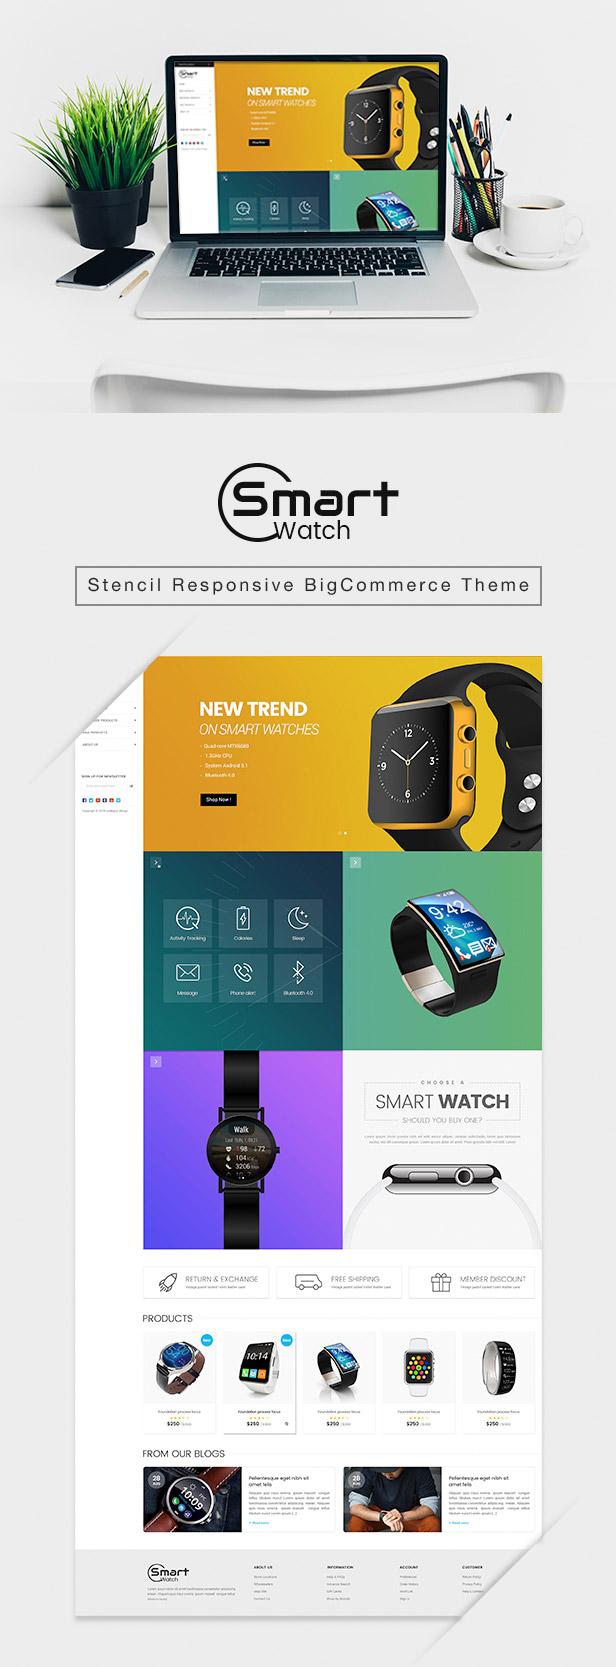 Materient Smart Watches Stencil BigCommerce Theme